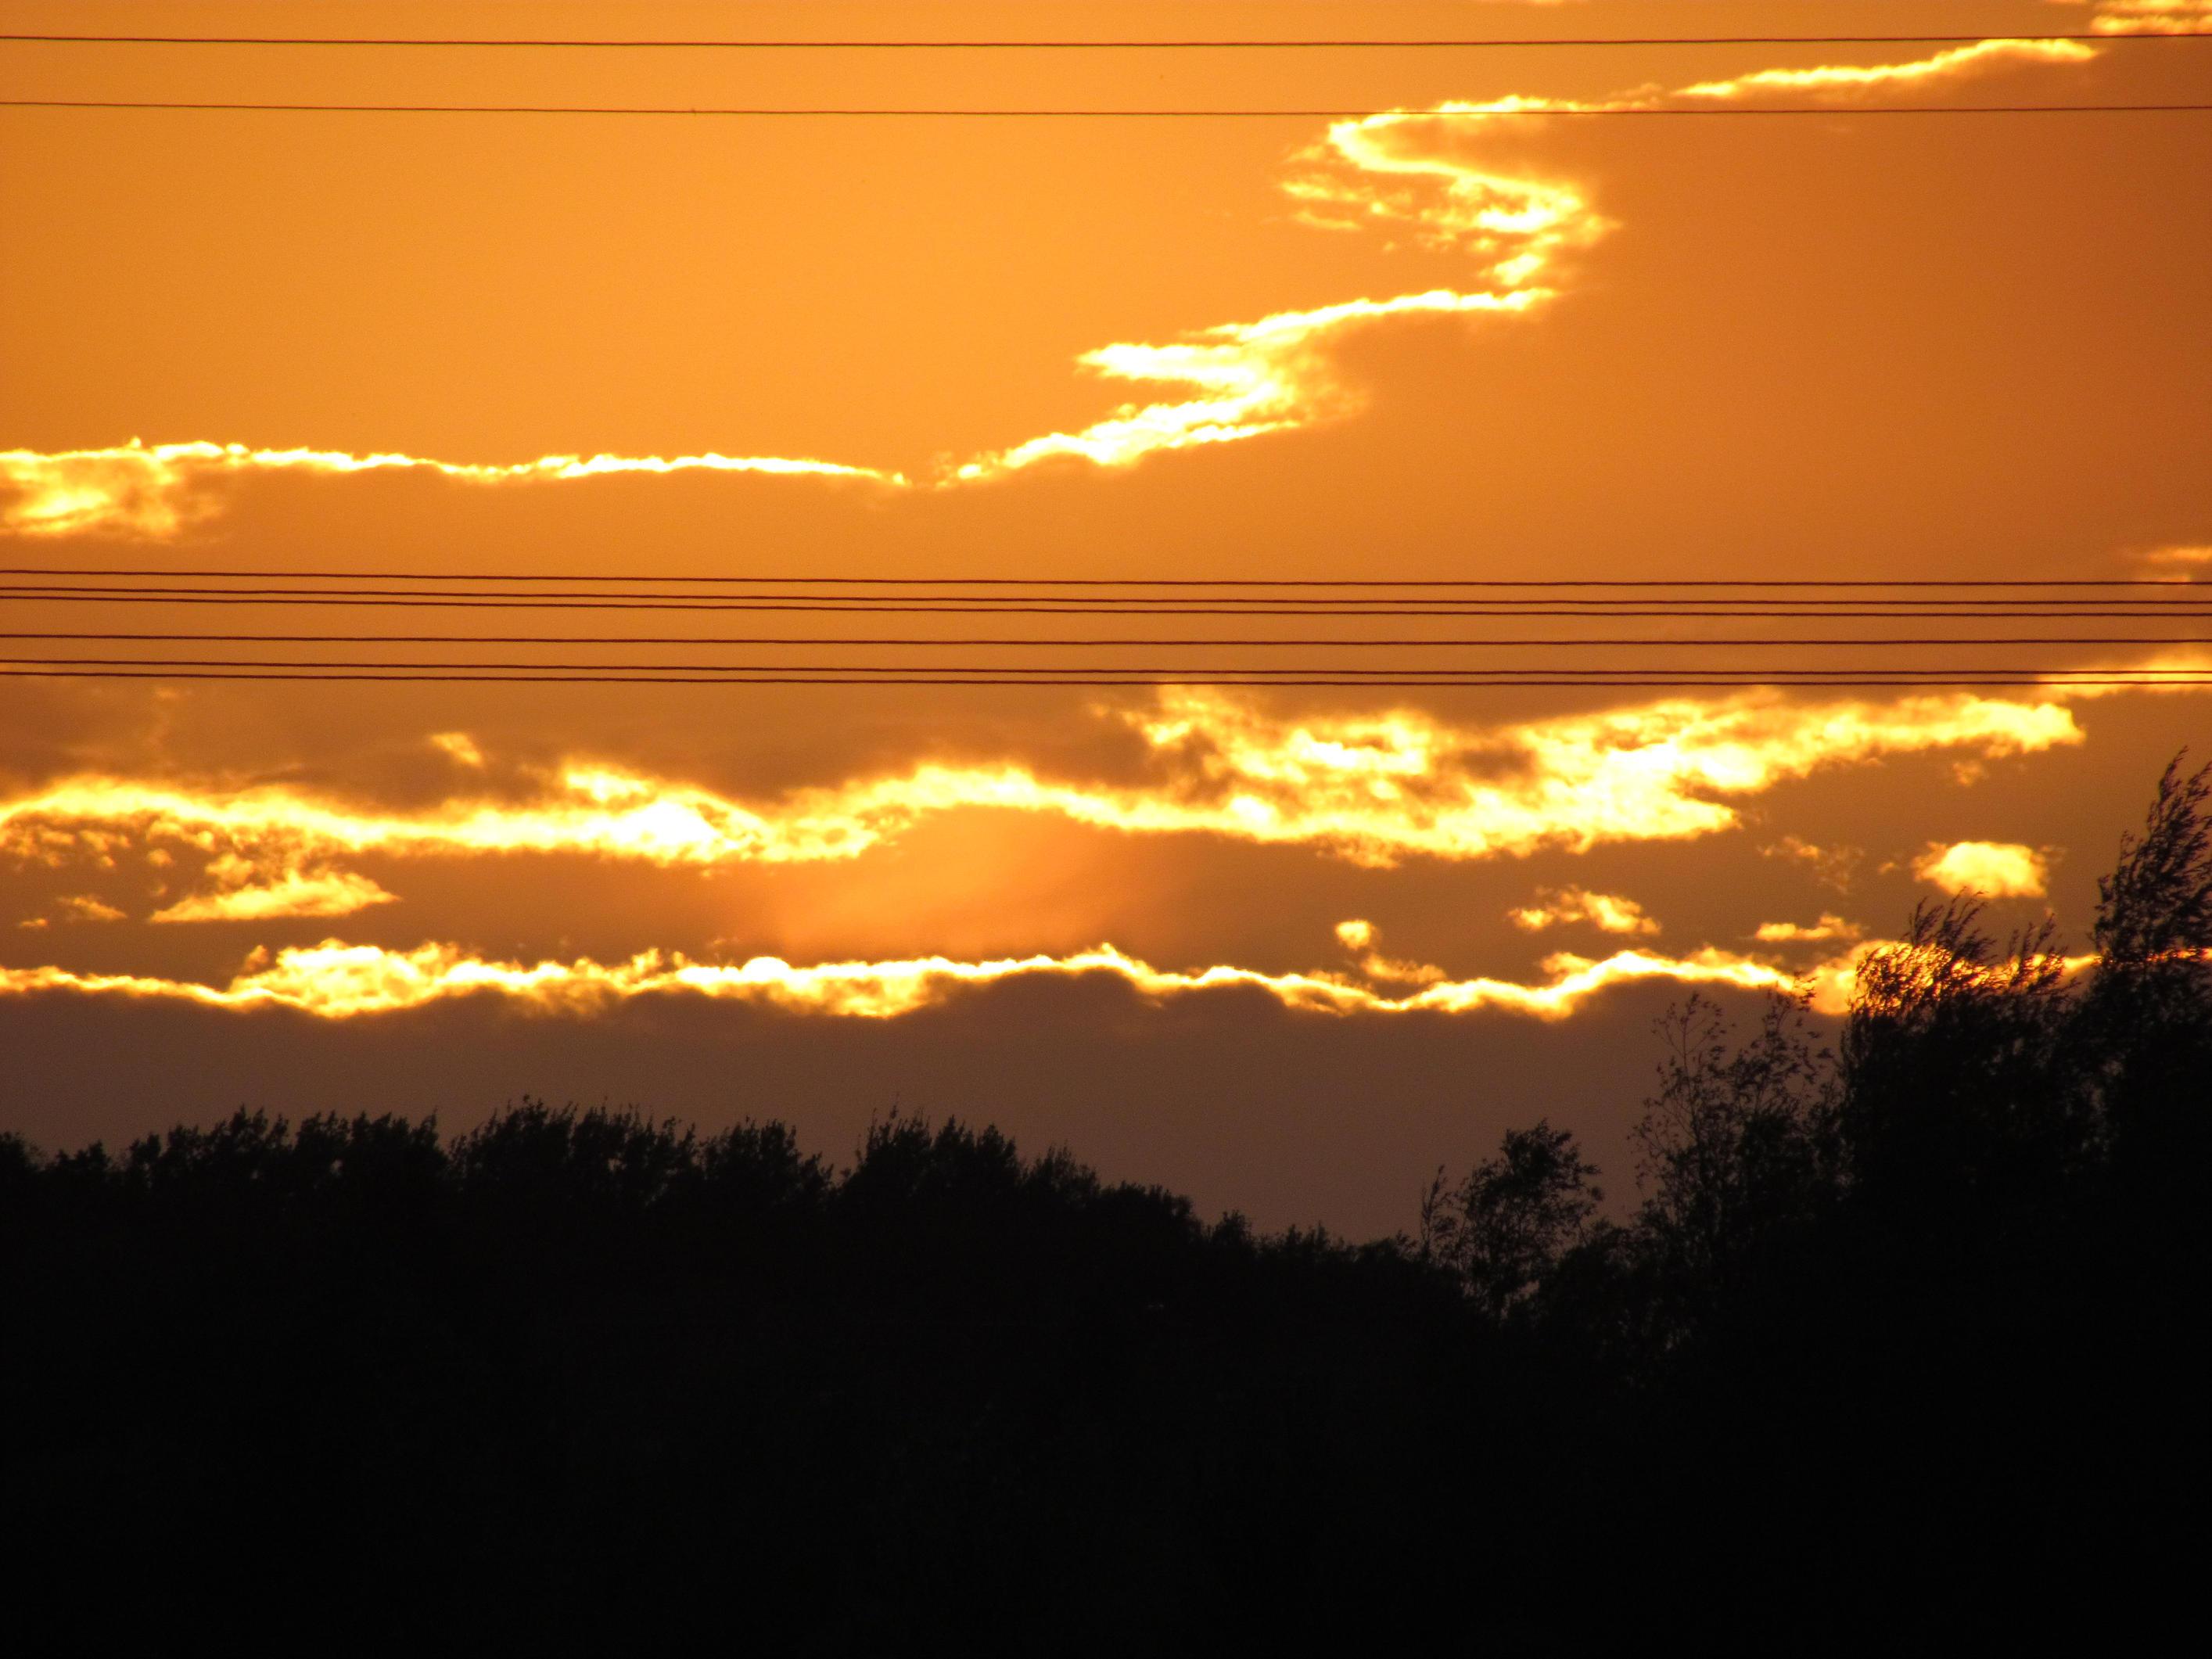 Another Sunset by bormolino